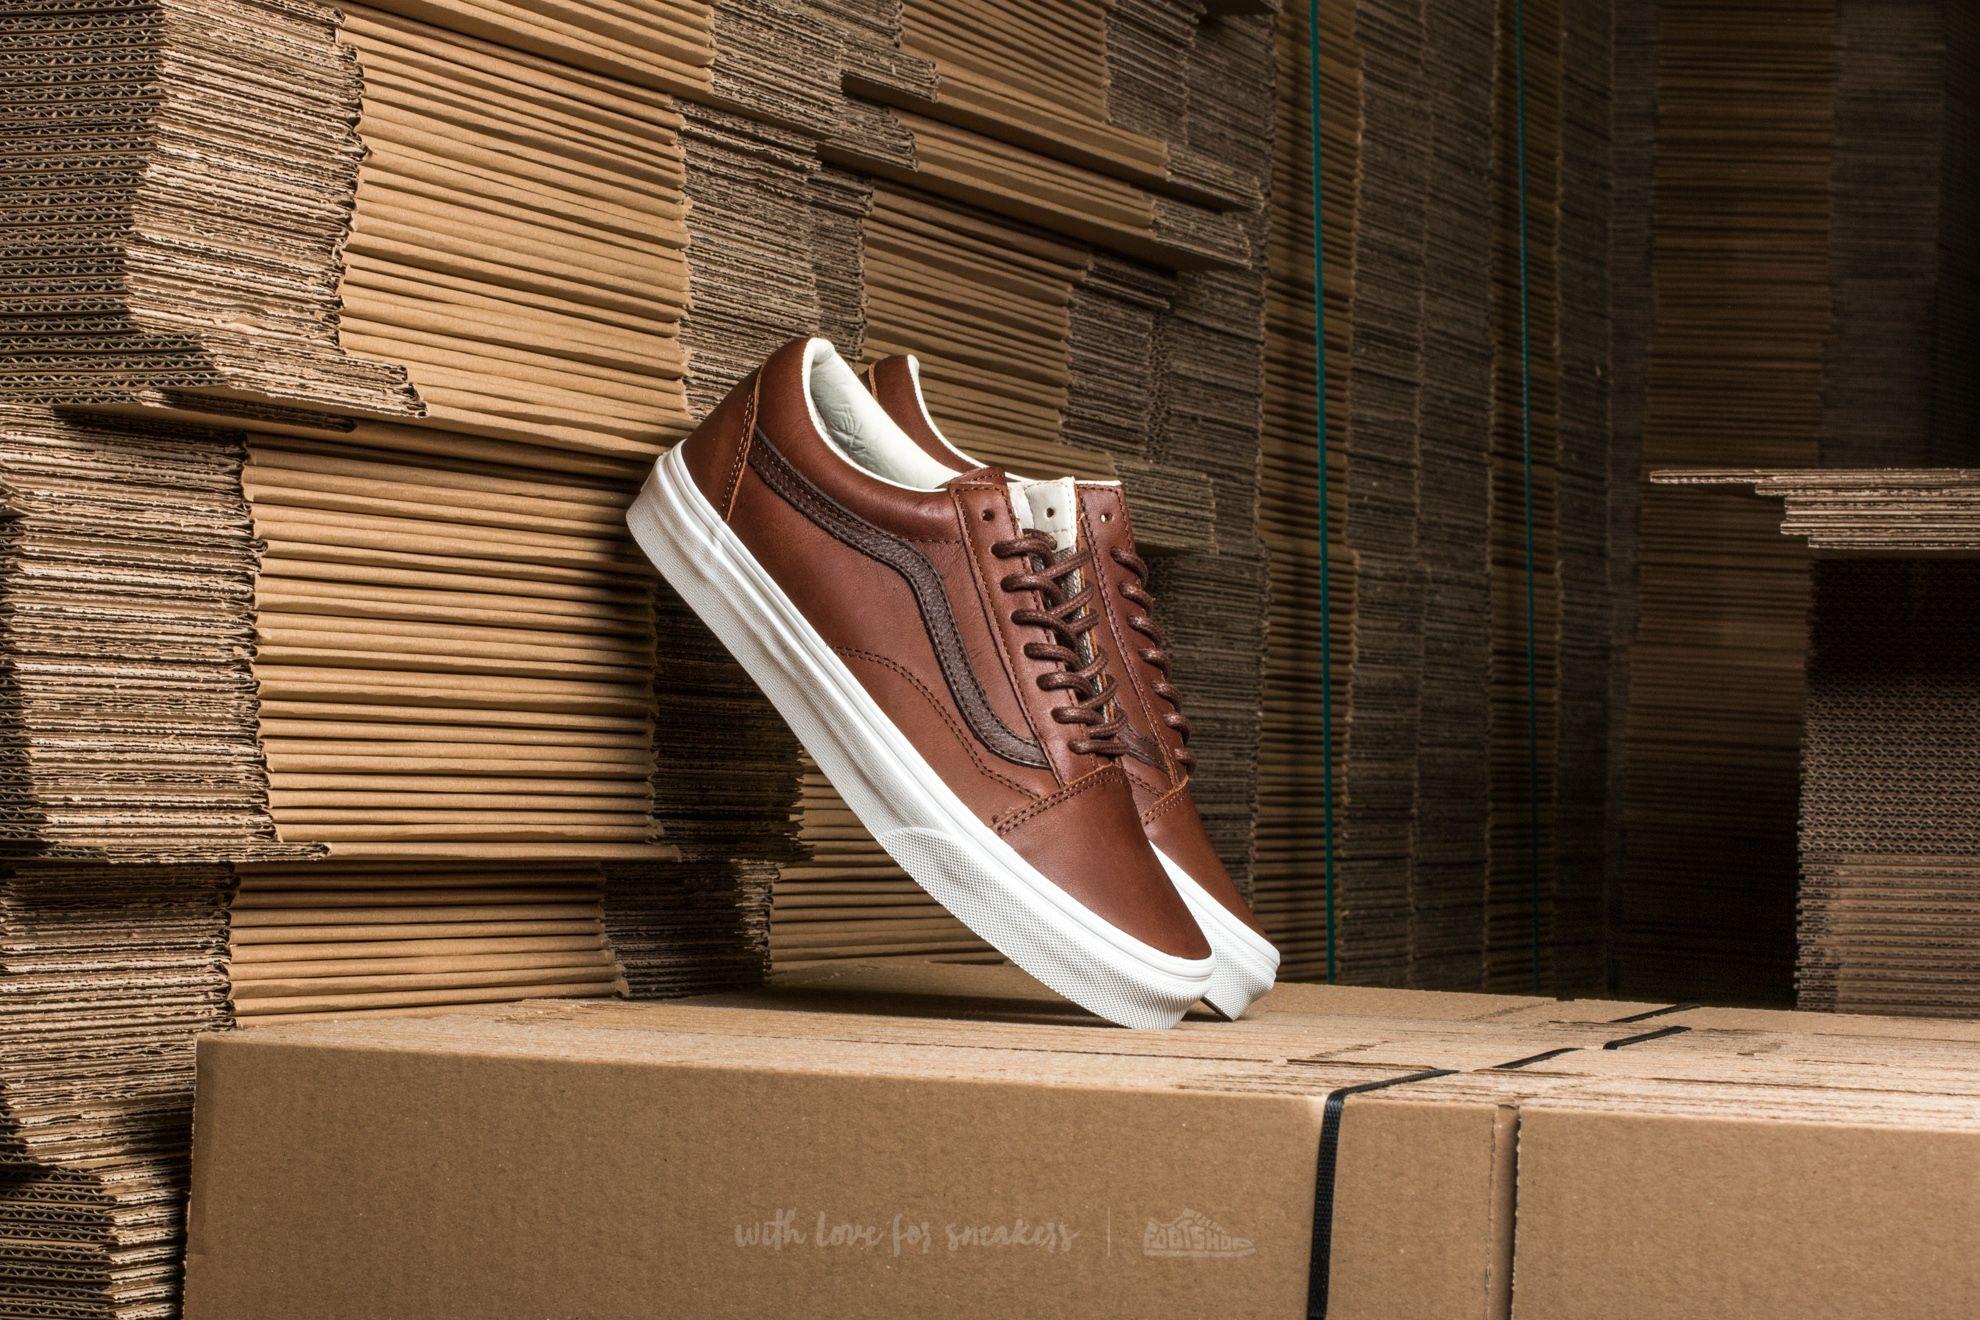 051a834b42c Vans Old Skool Leather Dachshund  Potting Soil